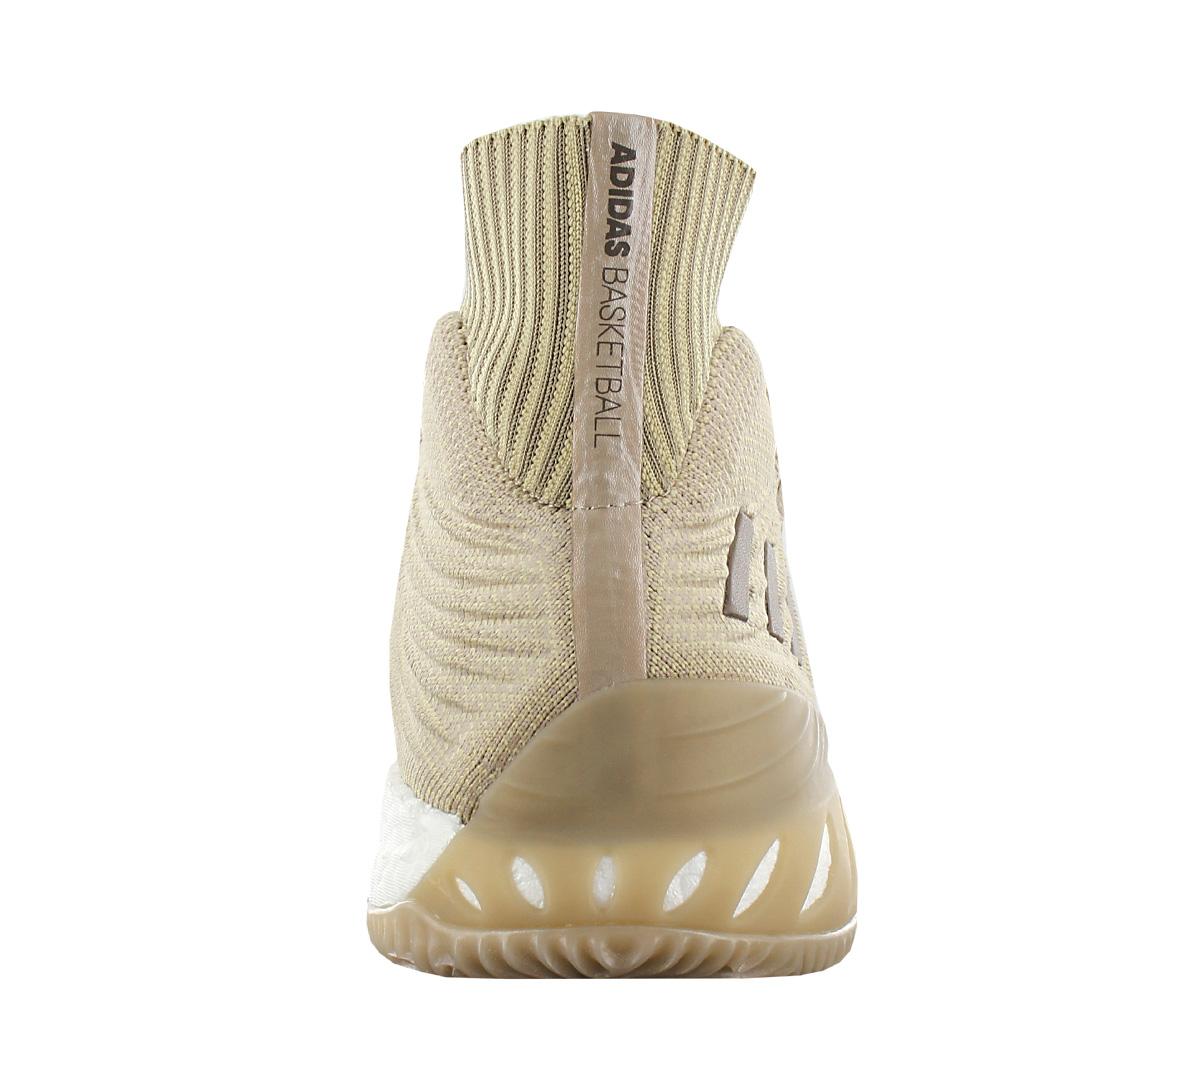 online store 91867 ab71a Adidas Crazy Explosive 2017 Pk Primeknit Mens Baketball Shoe